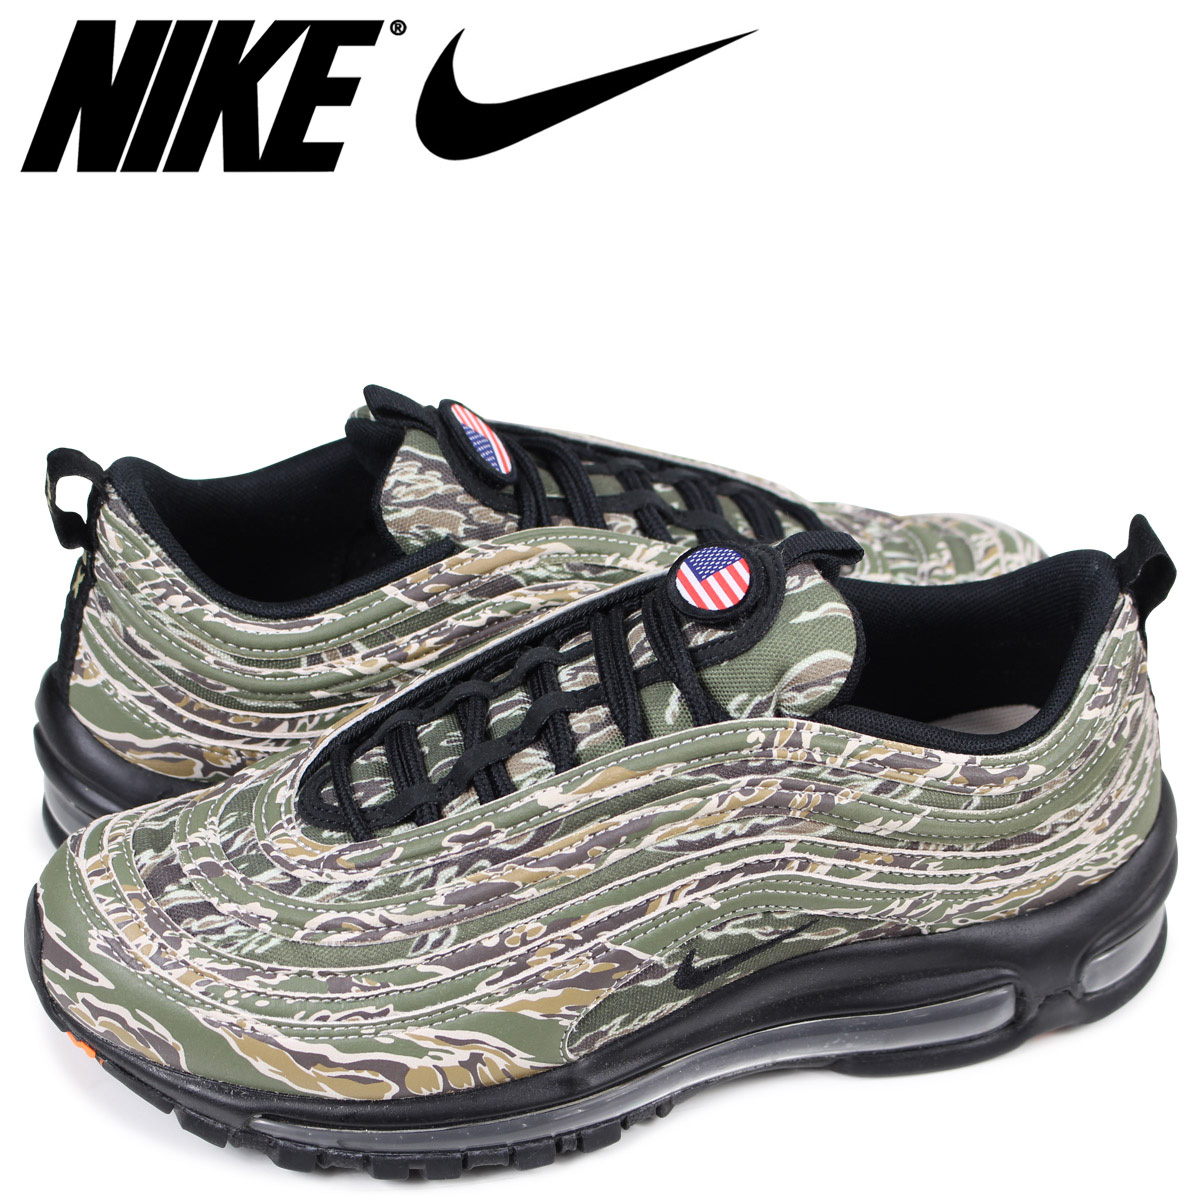 Buy NIKE AIR MAX 97 X OFF WHITE best price! Nike Free